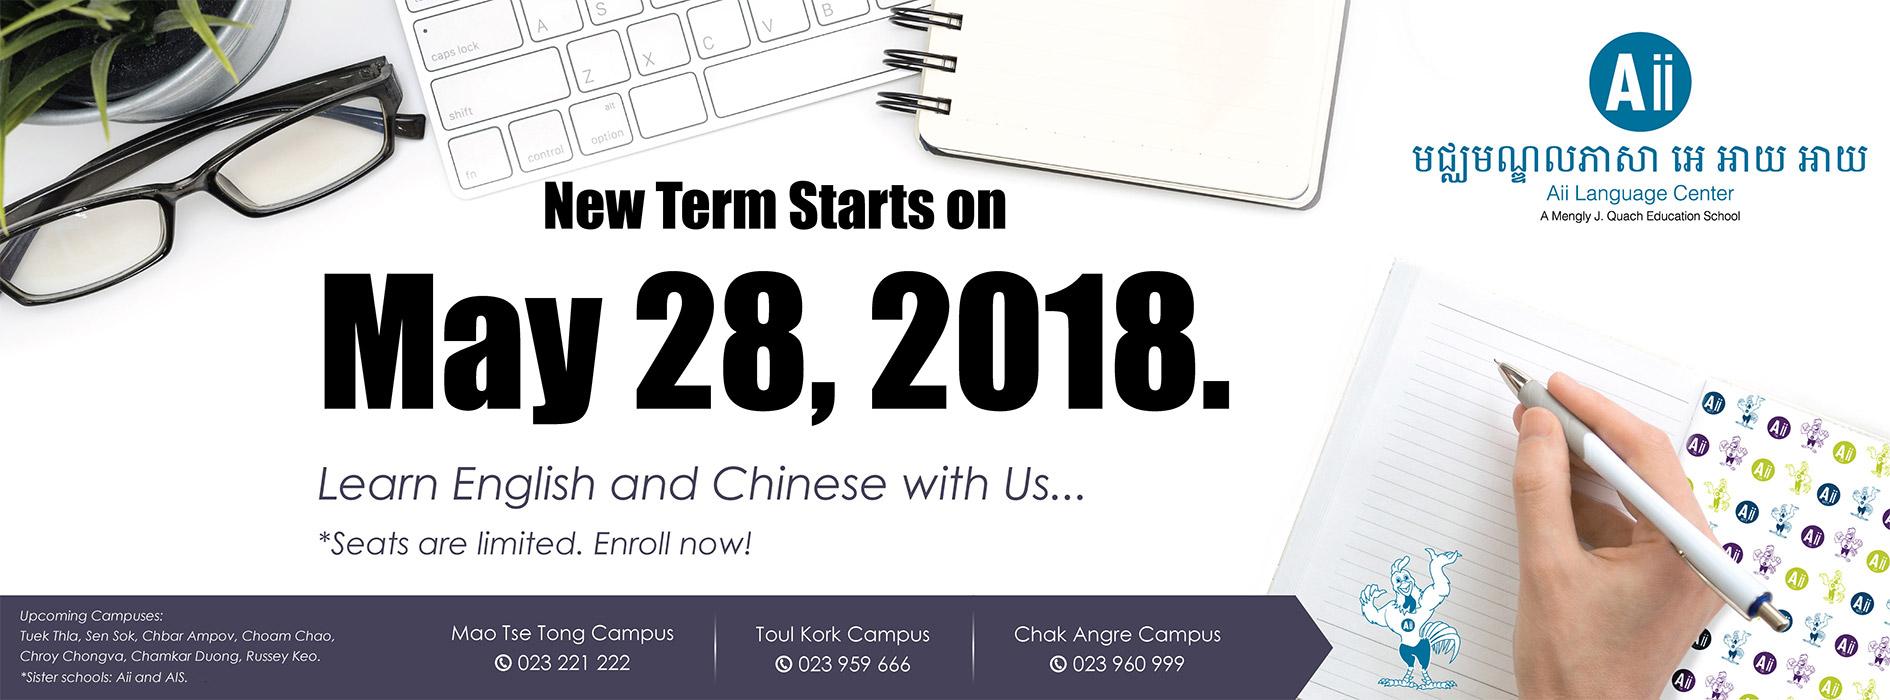 AiiLC-New-Term-57-Website-Slide-Show-1